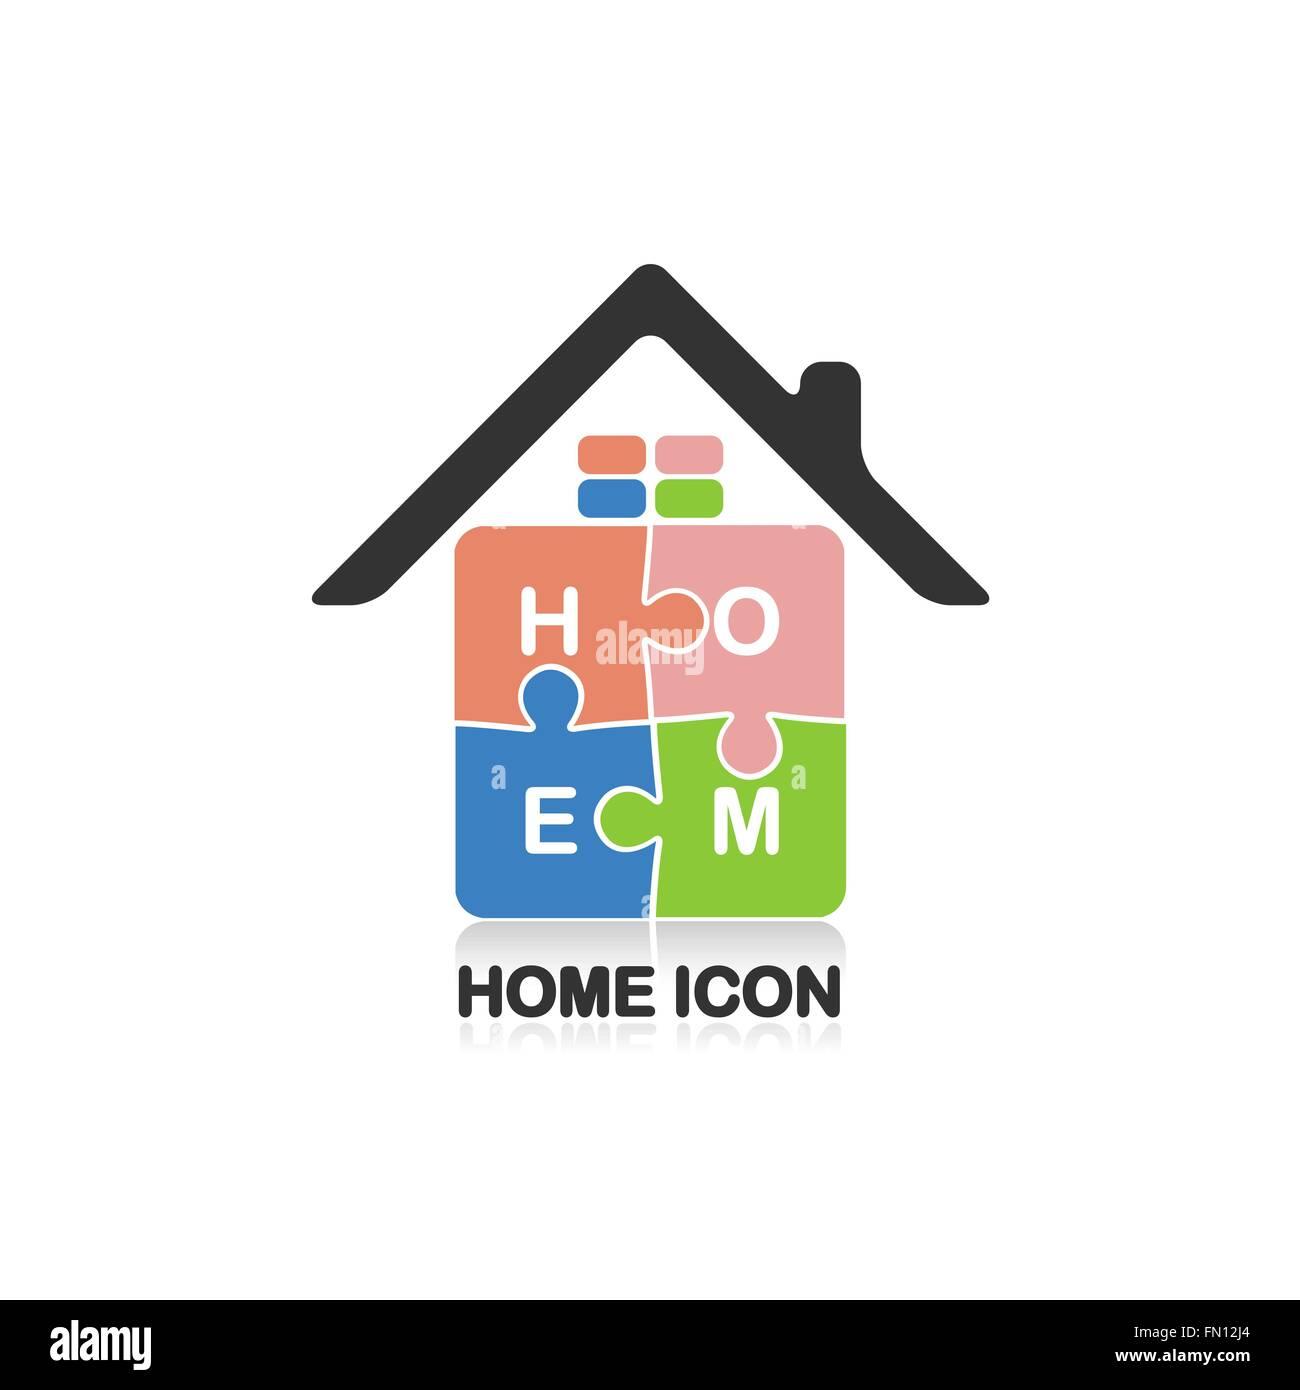 Real estate logo,creative house logo,abstract buildings logo,puzzle home symbol,home icon.Vector illustration - Stock Vector